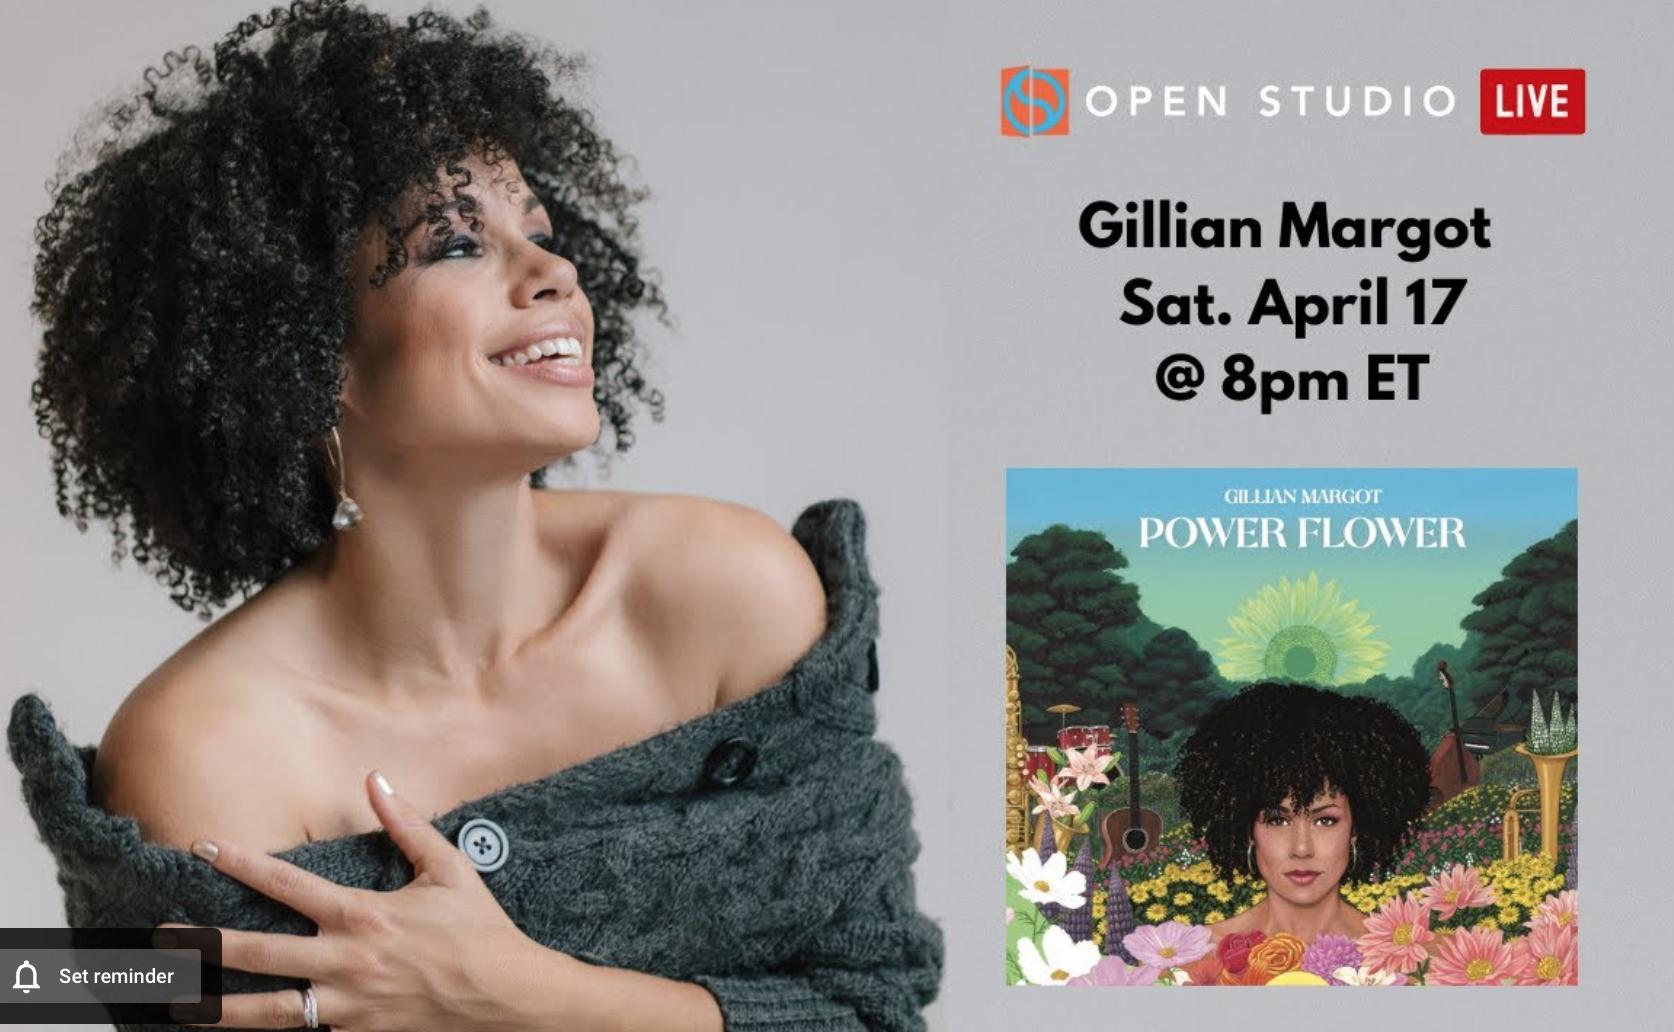 Gillian Margot Virtual Concert On Open Studio Live!